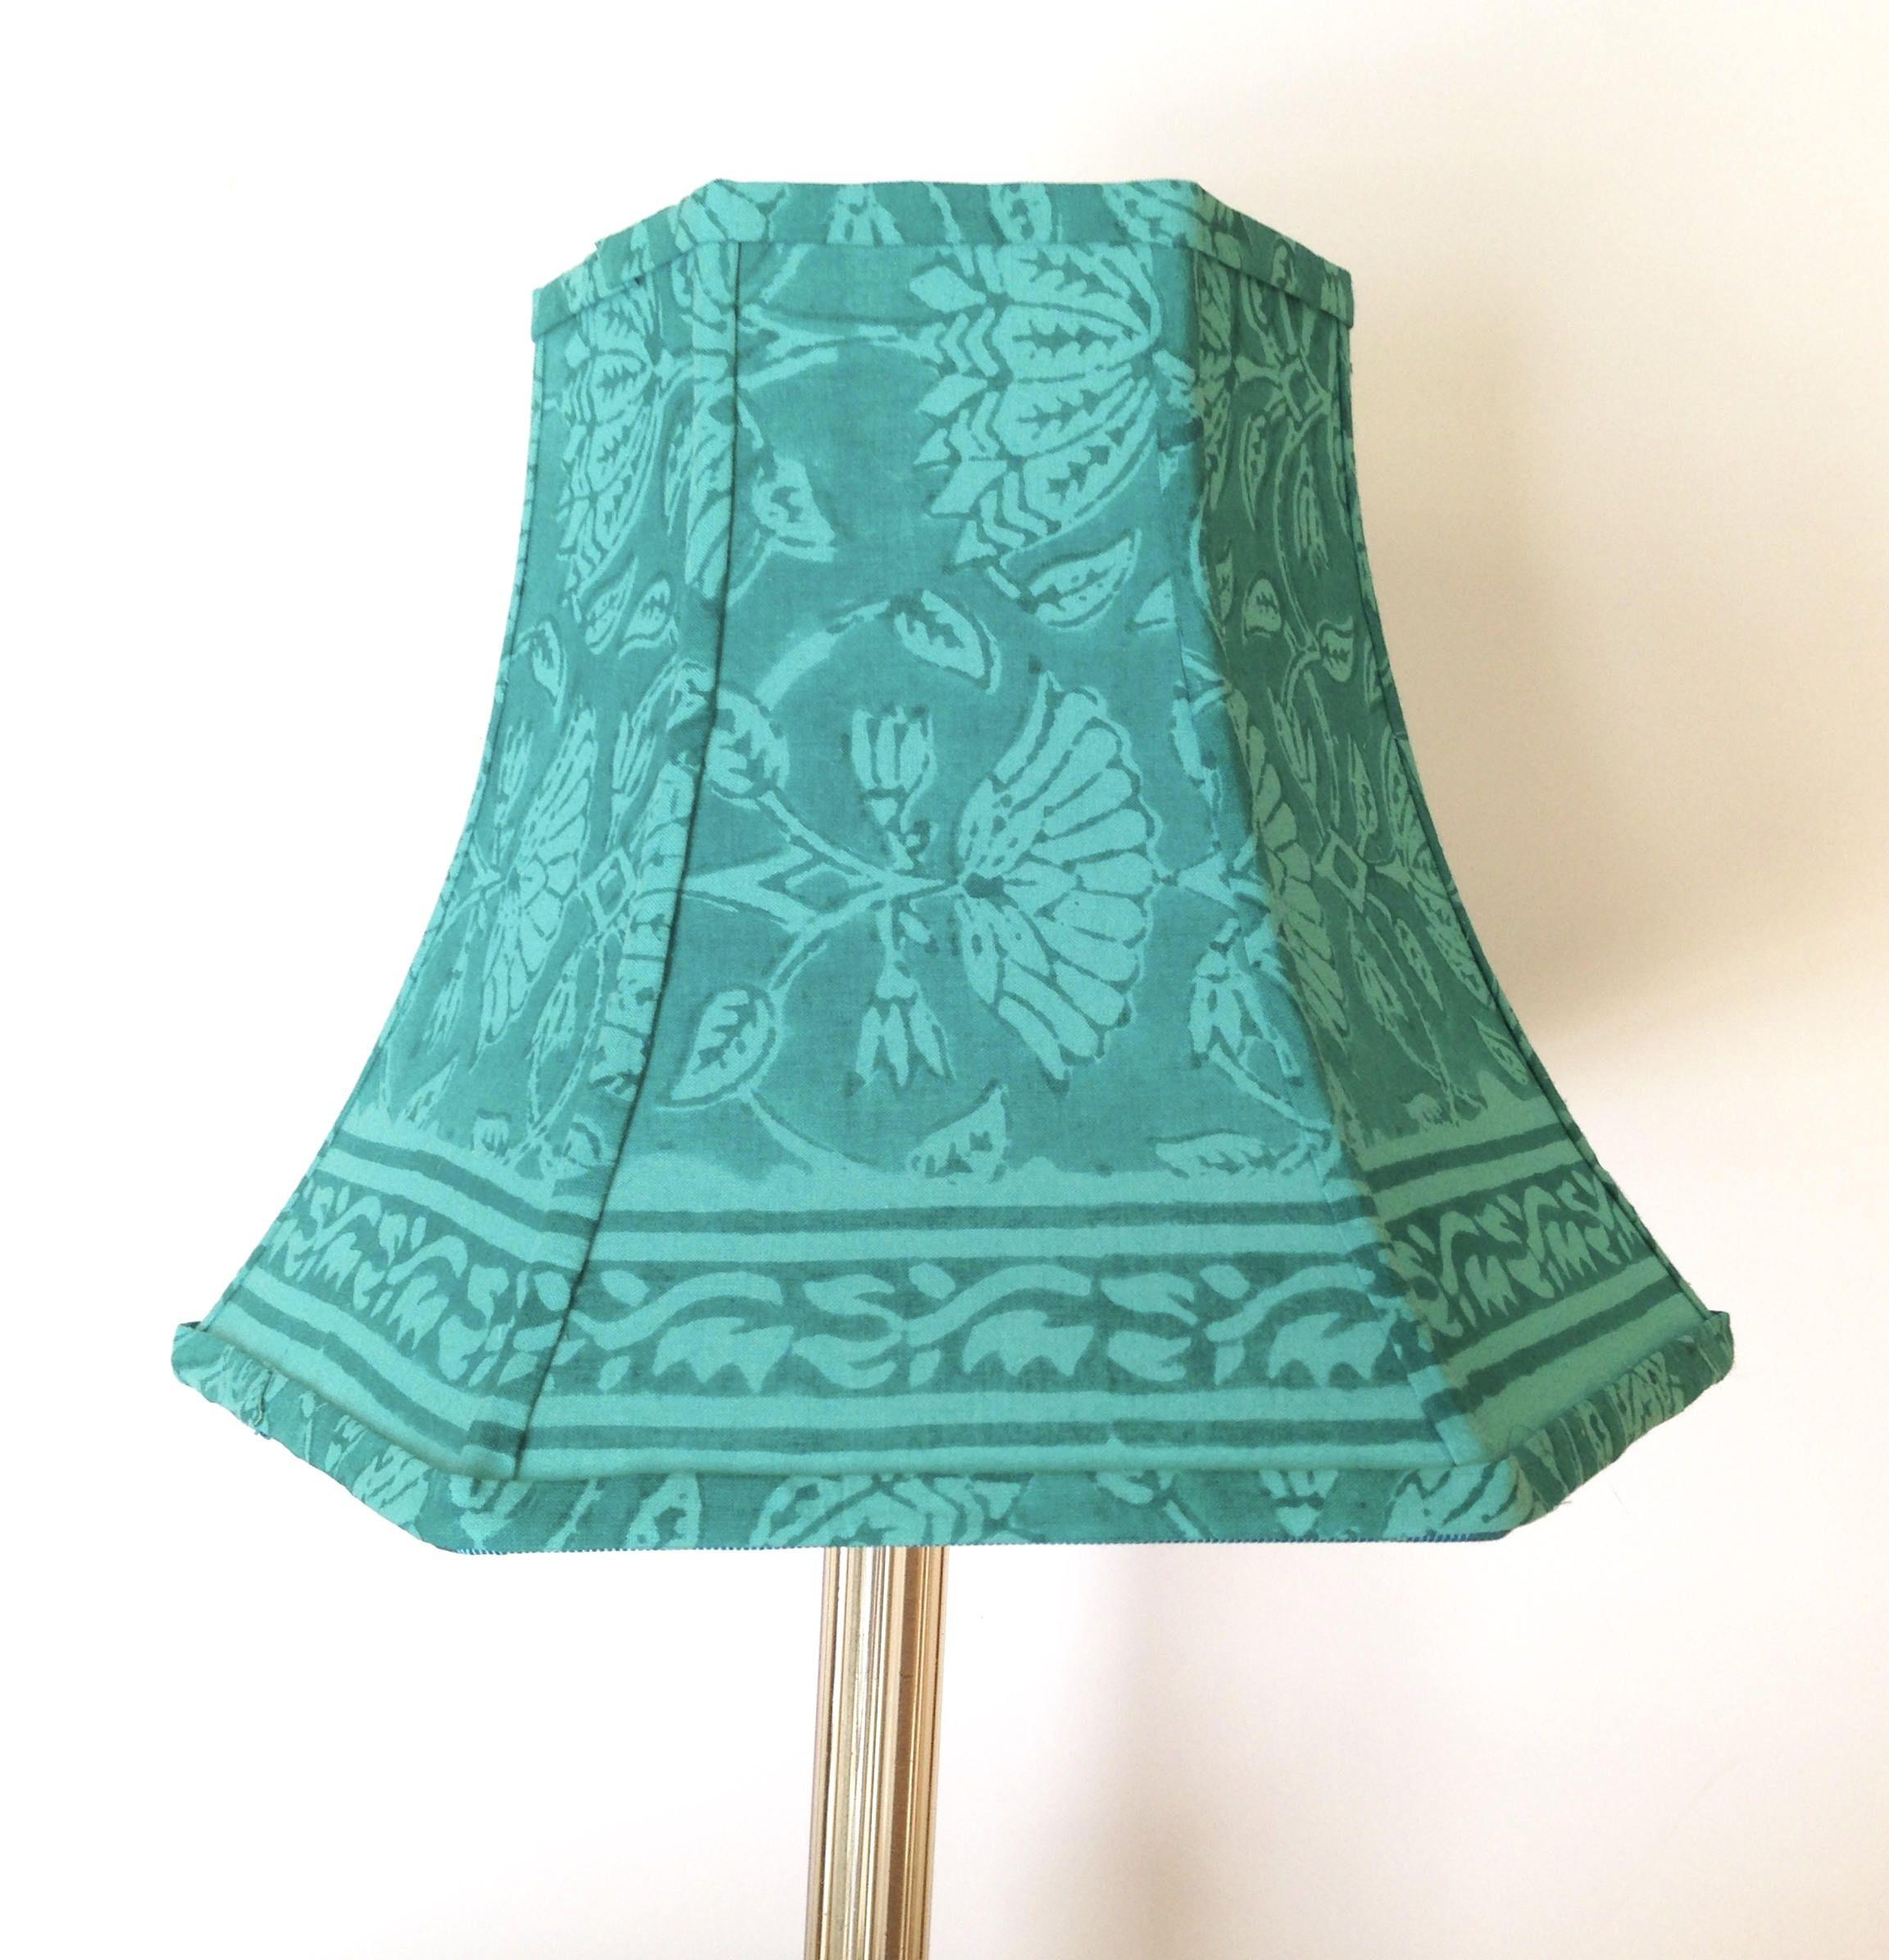 Turquoise Lamp Shade Block Print Fabric Vibrant Boho Block Printing Fabric Turquoise Lamp Turquoise Lamp Shade